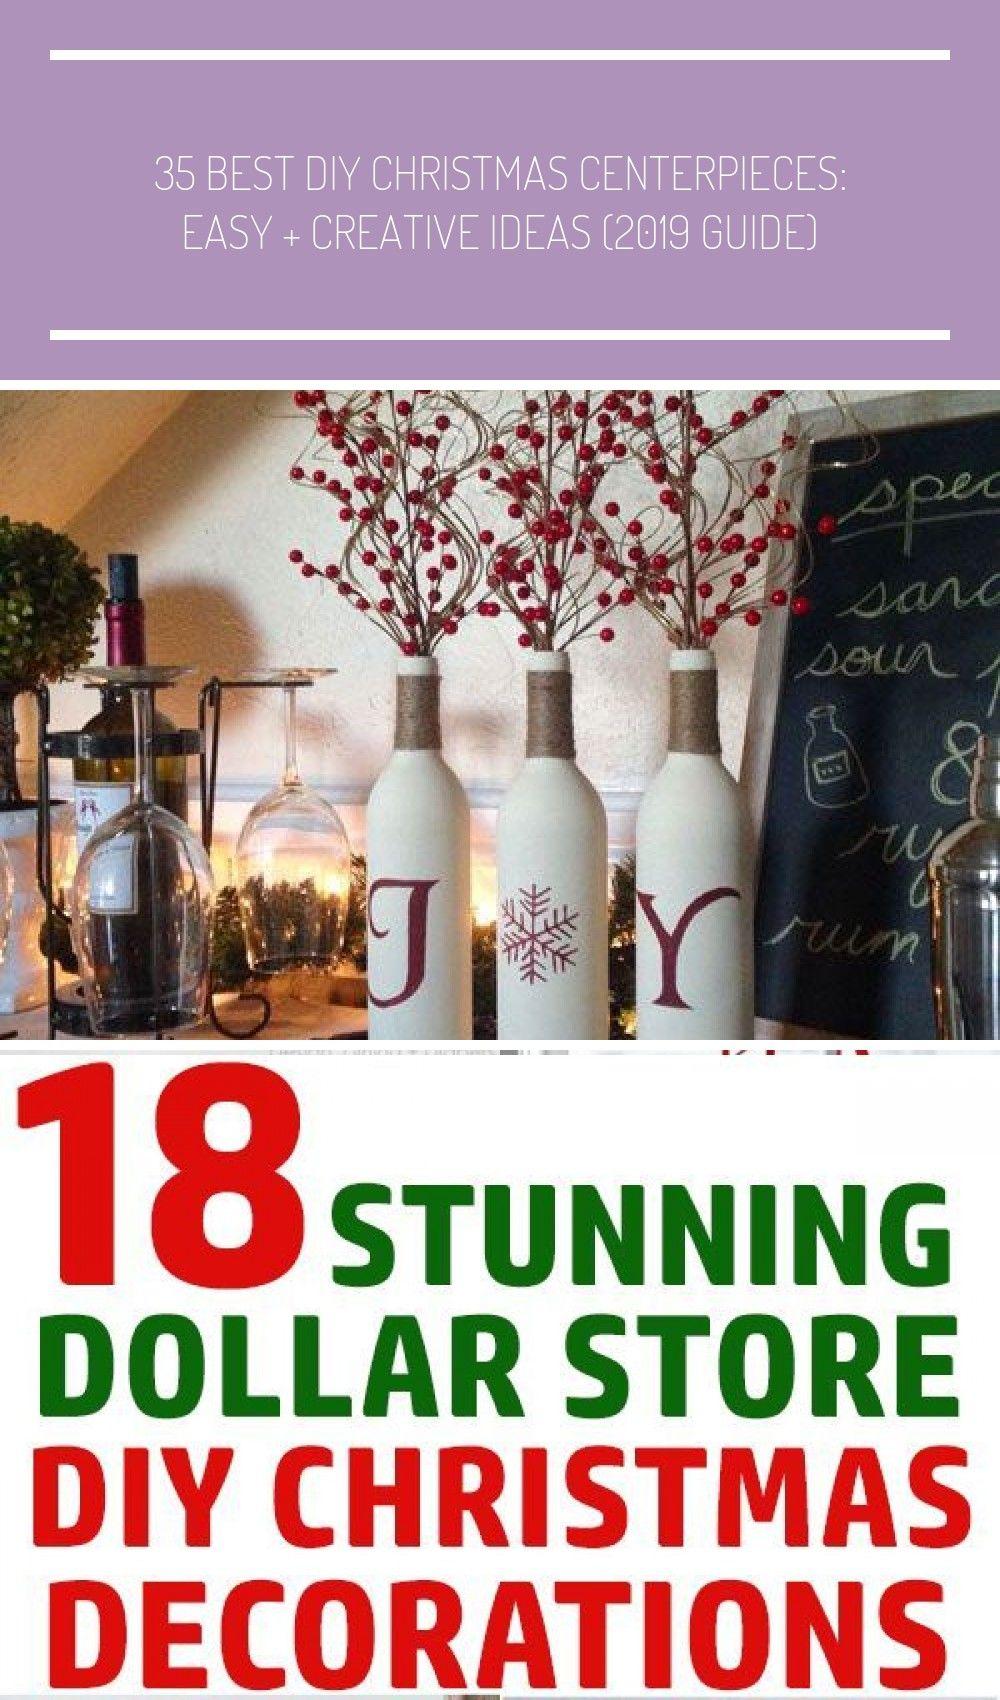 Inexpensive Christmas Centerpiece Ideas - Christmas Decorations, Christmas Centerpieces, DIY Christ